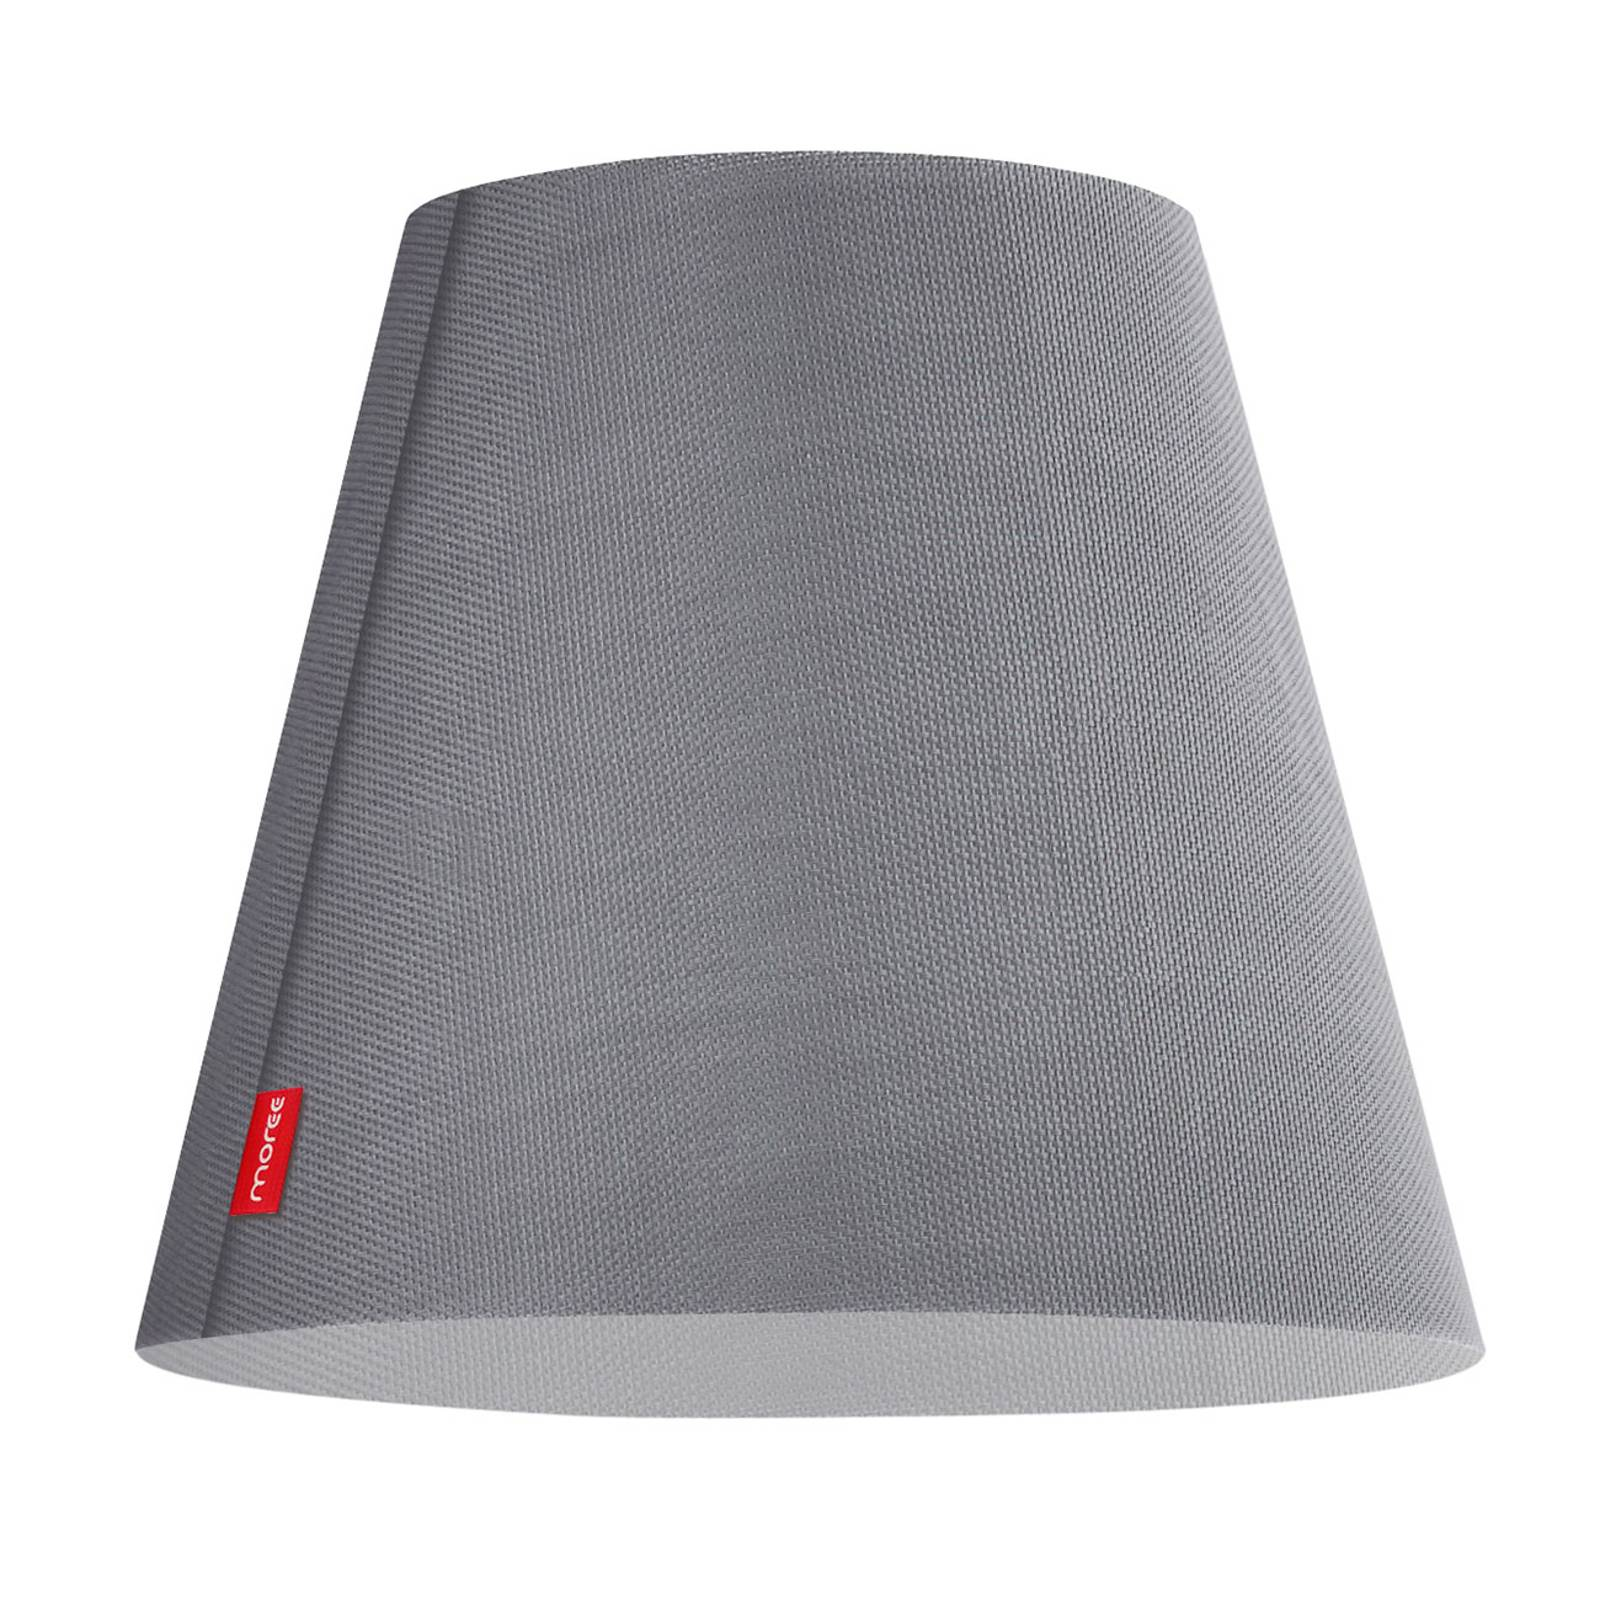 Swap Outdoor -lattiavalo, grey coated fabric